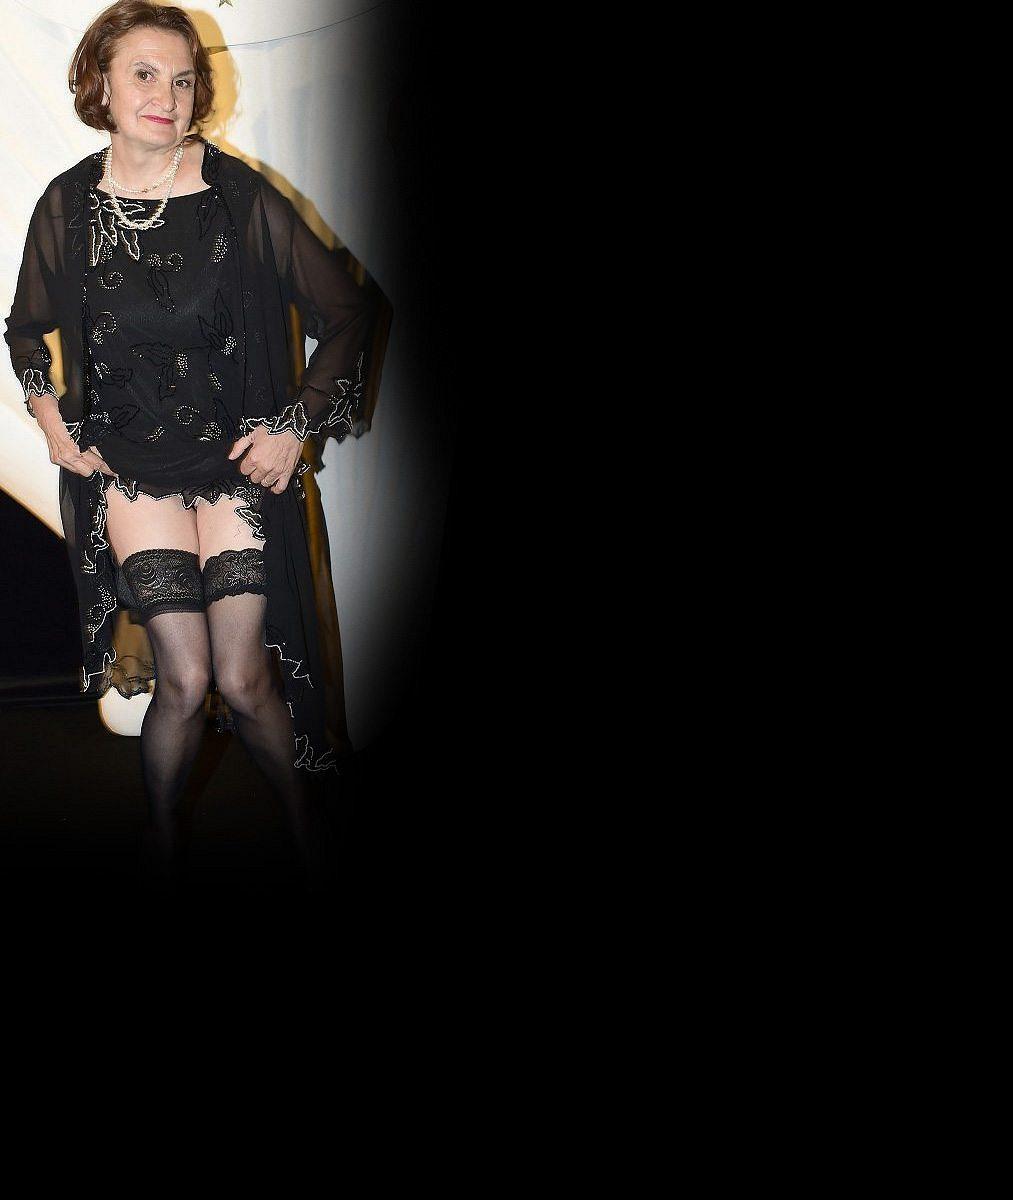 To je ale šťabajzna: Eva Holubová se pochlubila retro fotkou v prádélku